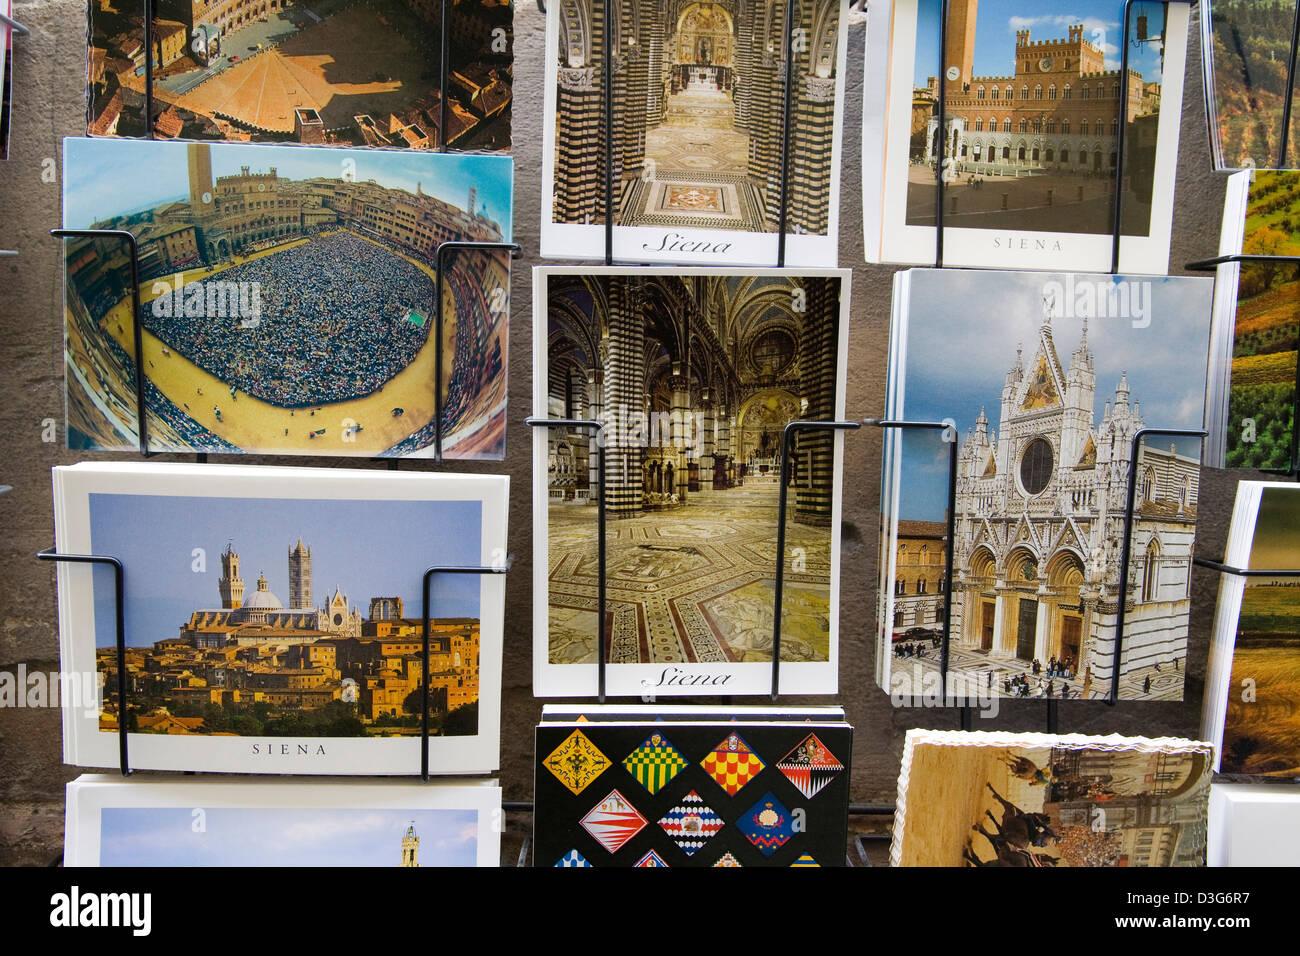 europe, italy, tuscany, siena, postcards of siena - Stock Image